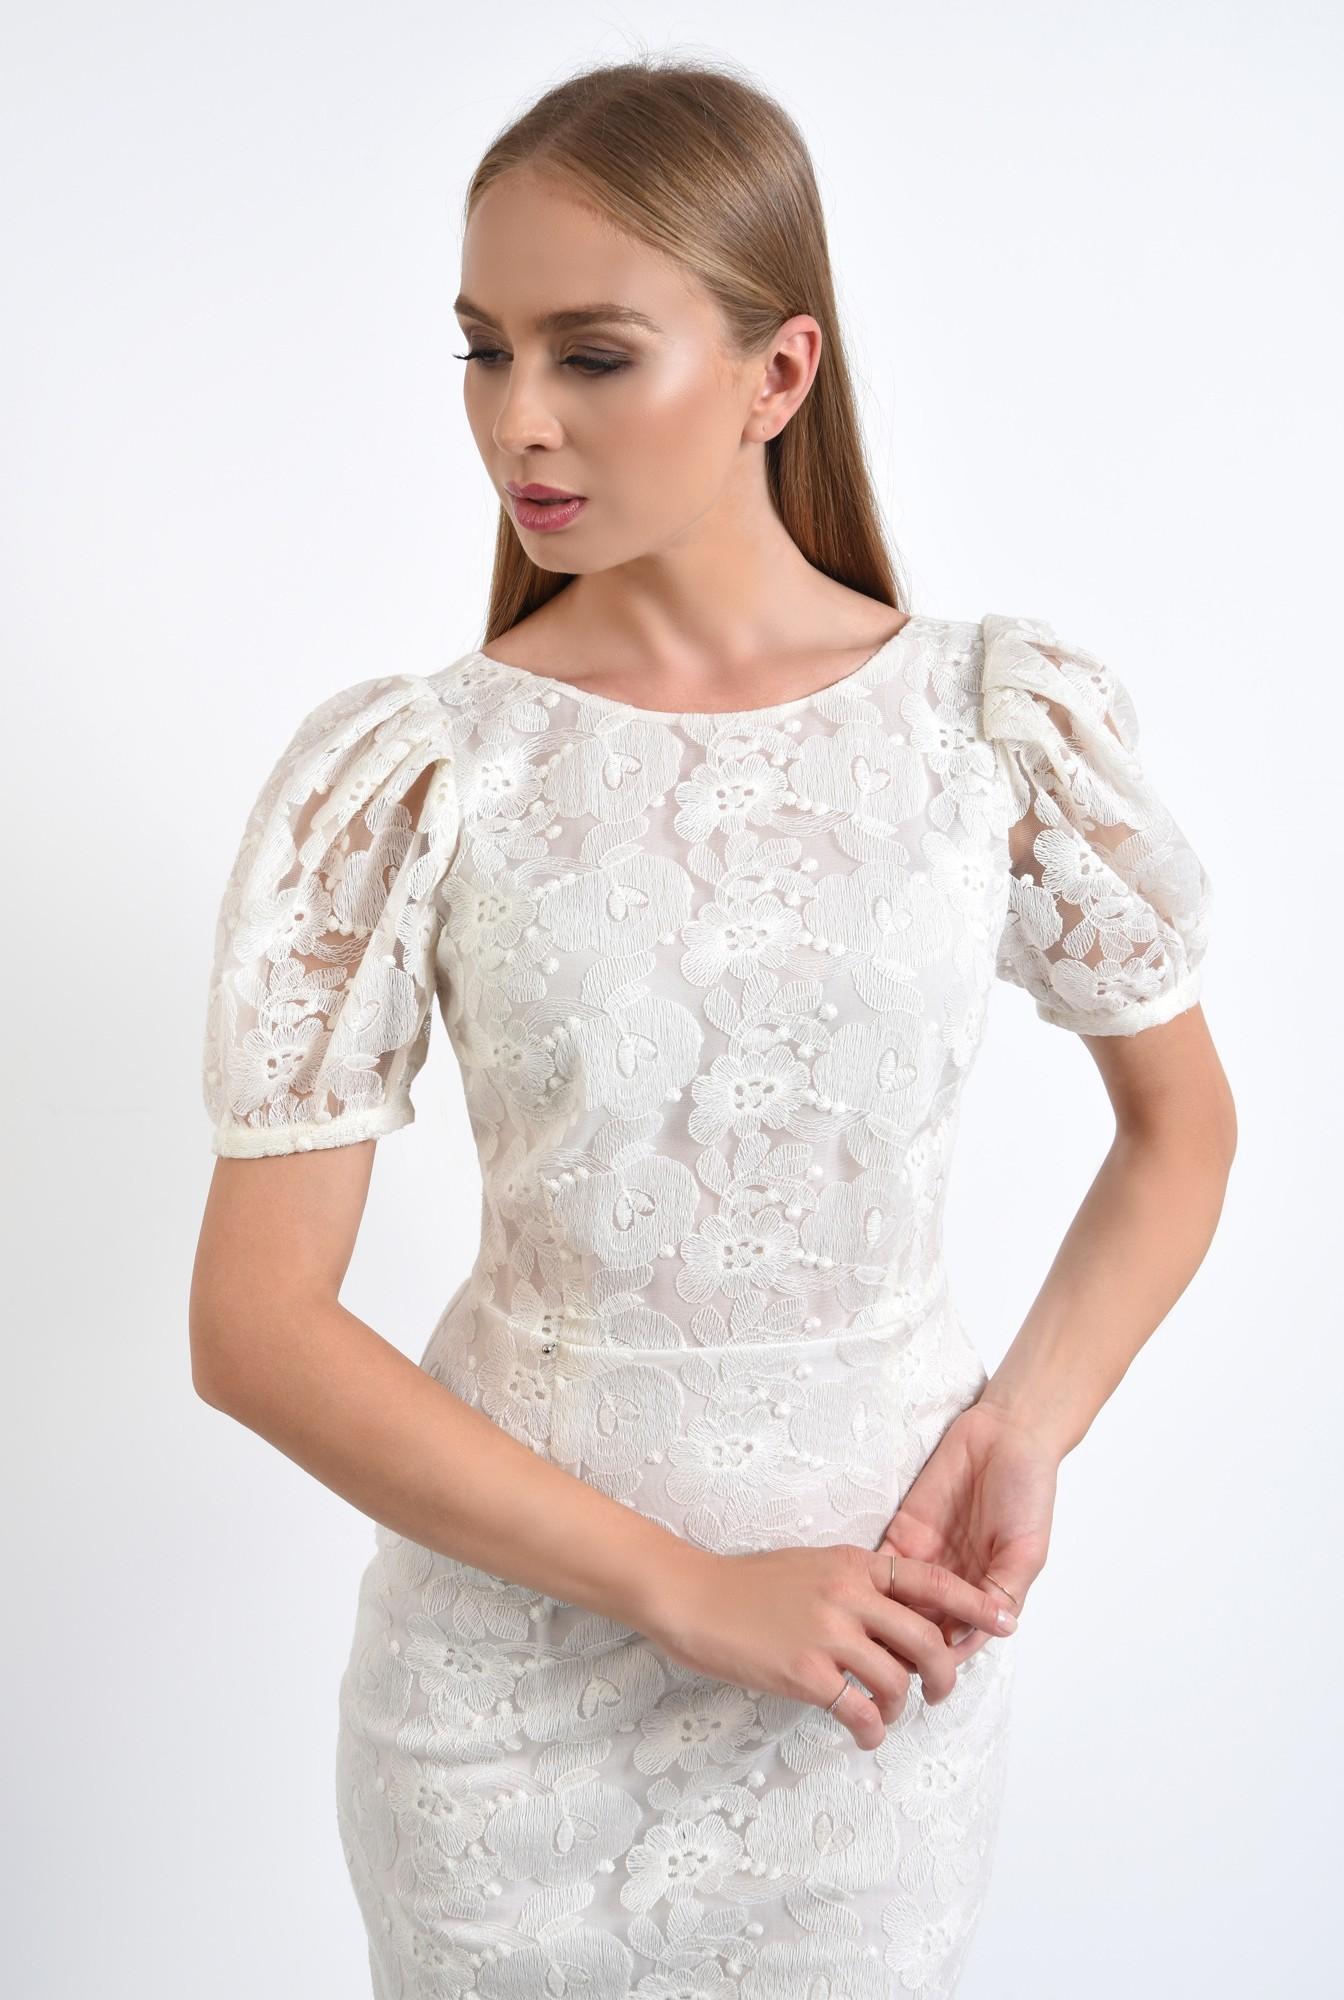 2 - rochie de seara, dantela, alb, conica